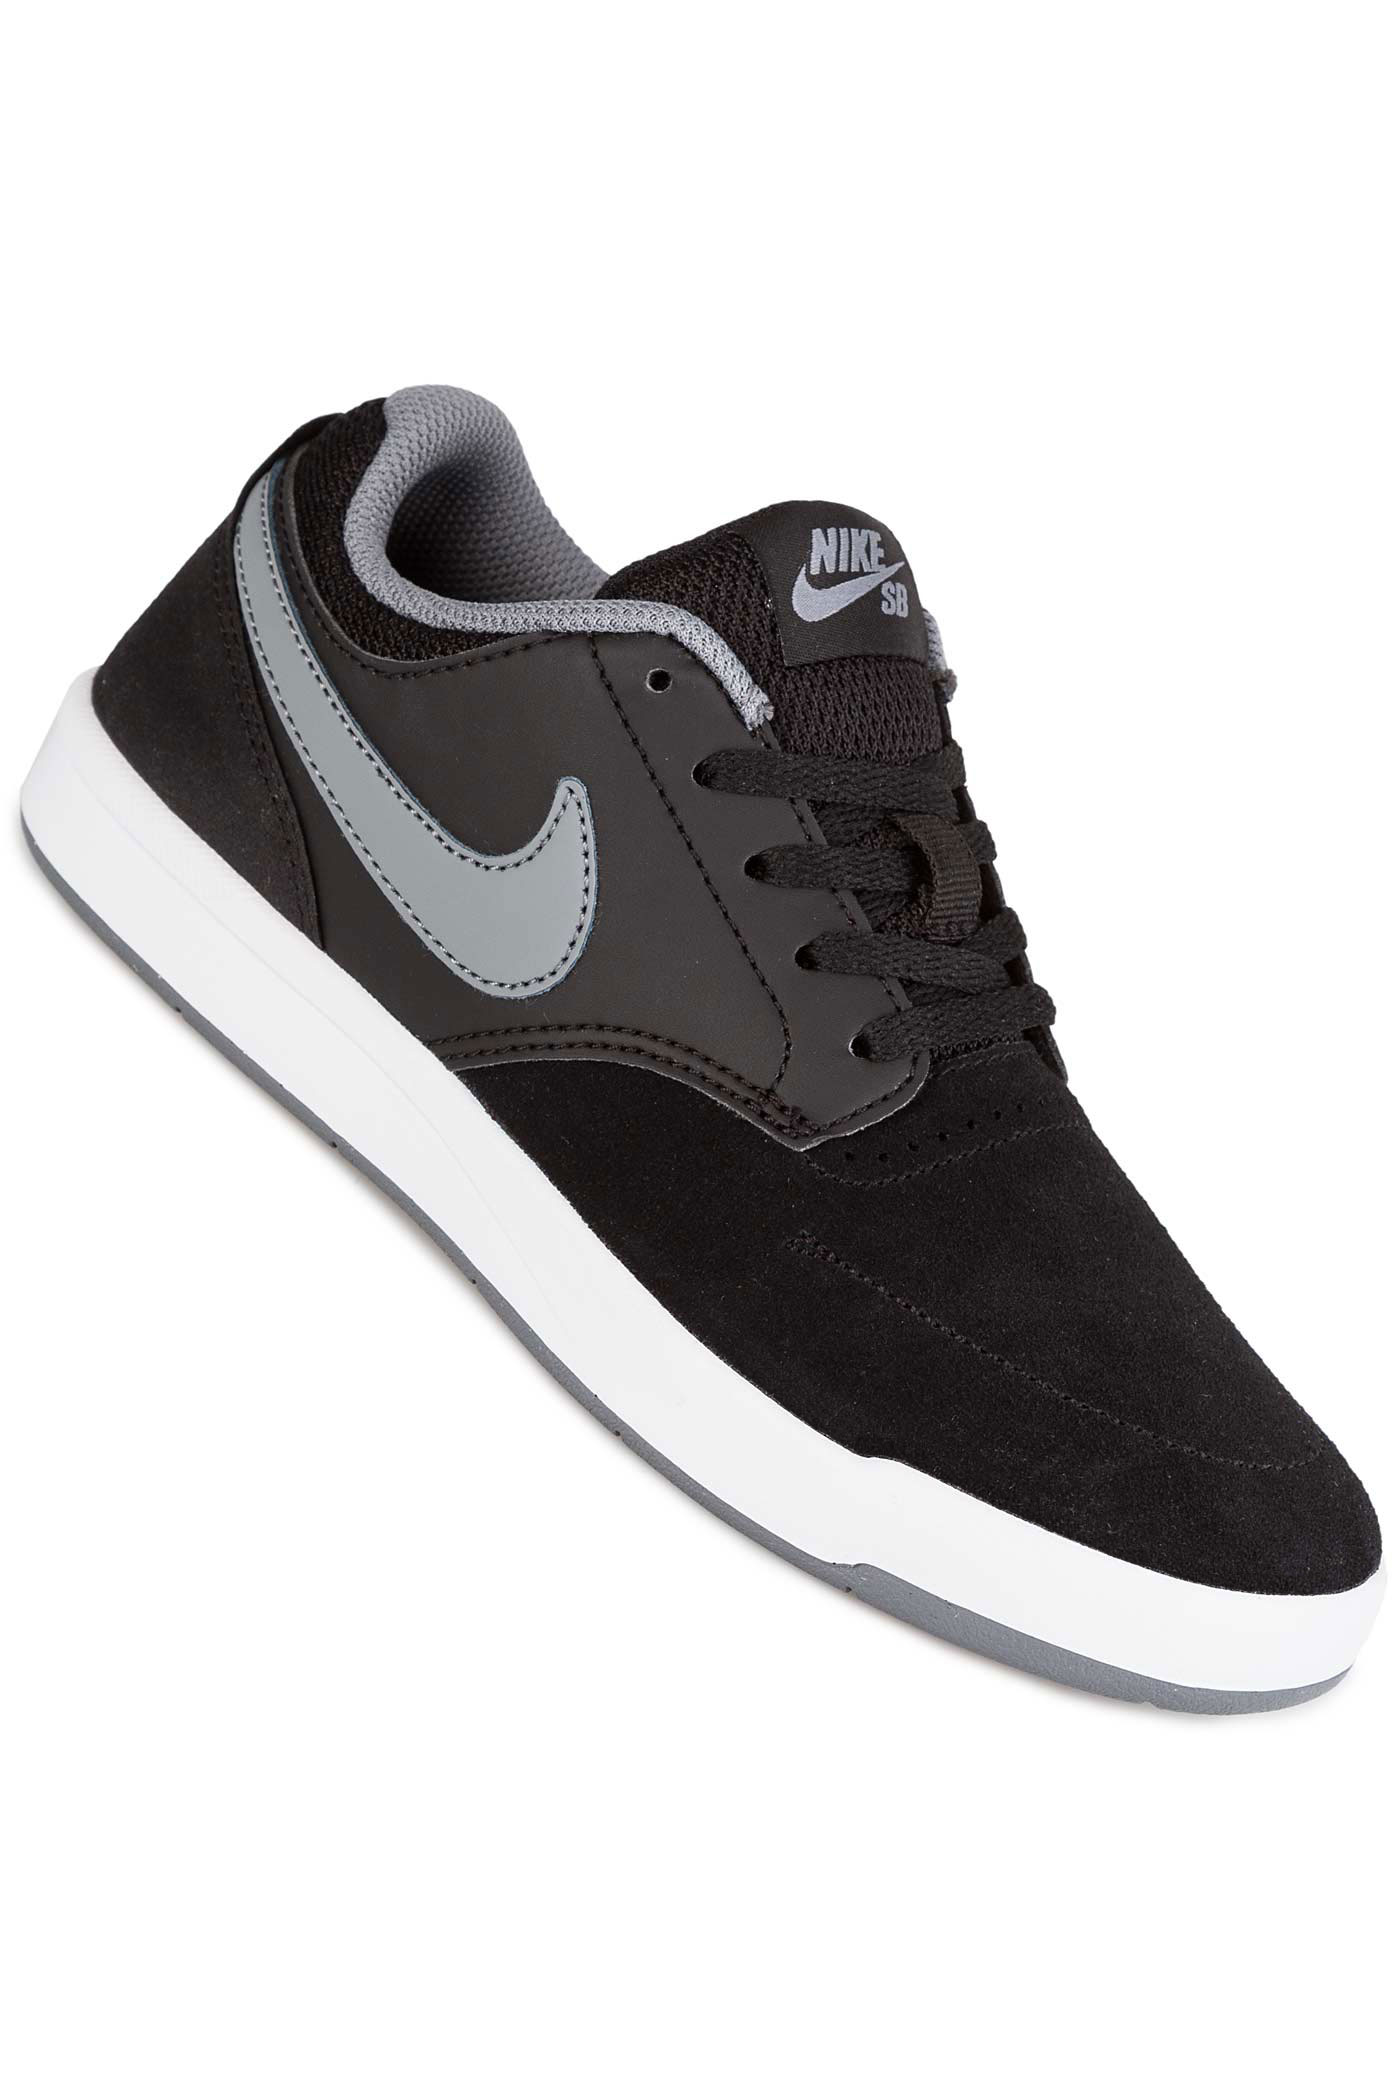 nike sb fokus chaussure kids black cool grey achetez sur skatedeluxe. Black Bedroom Furniture Sets. Home Design Ideas